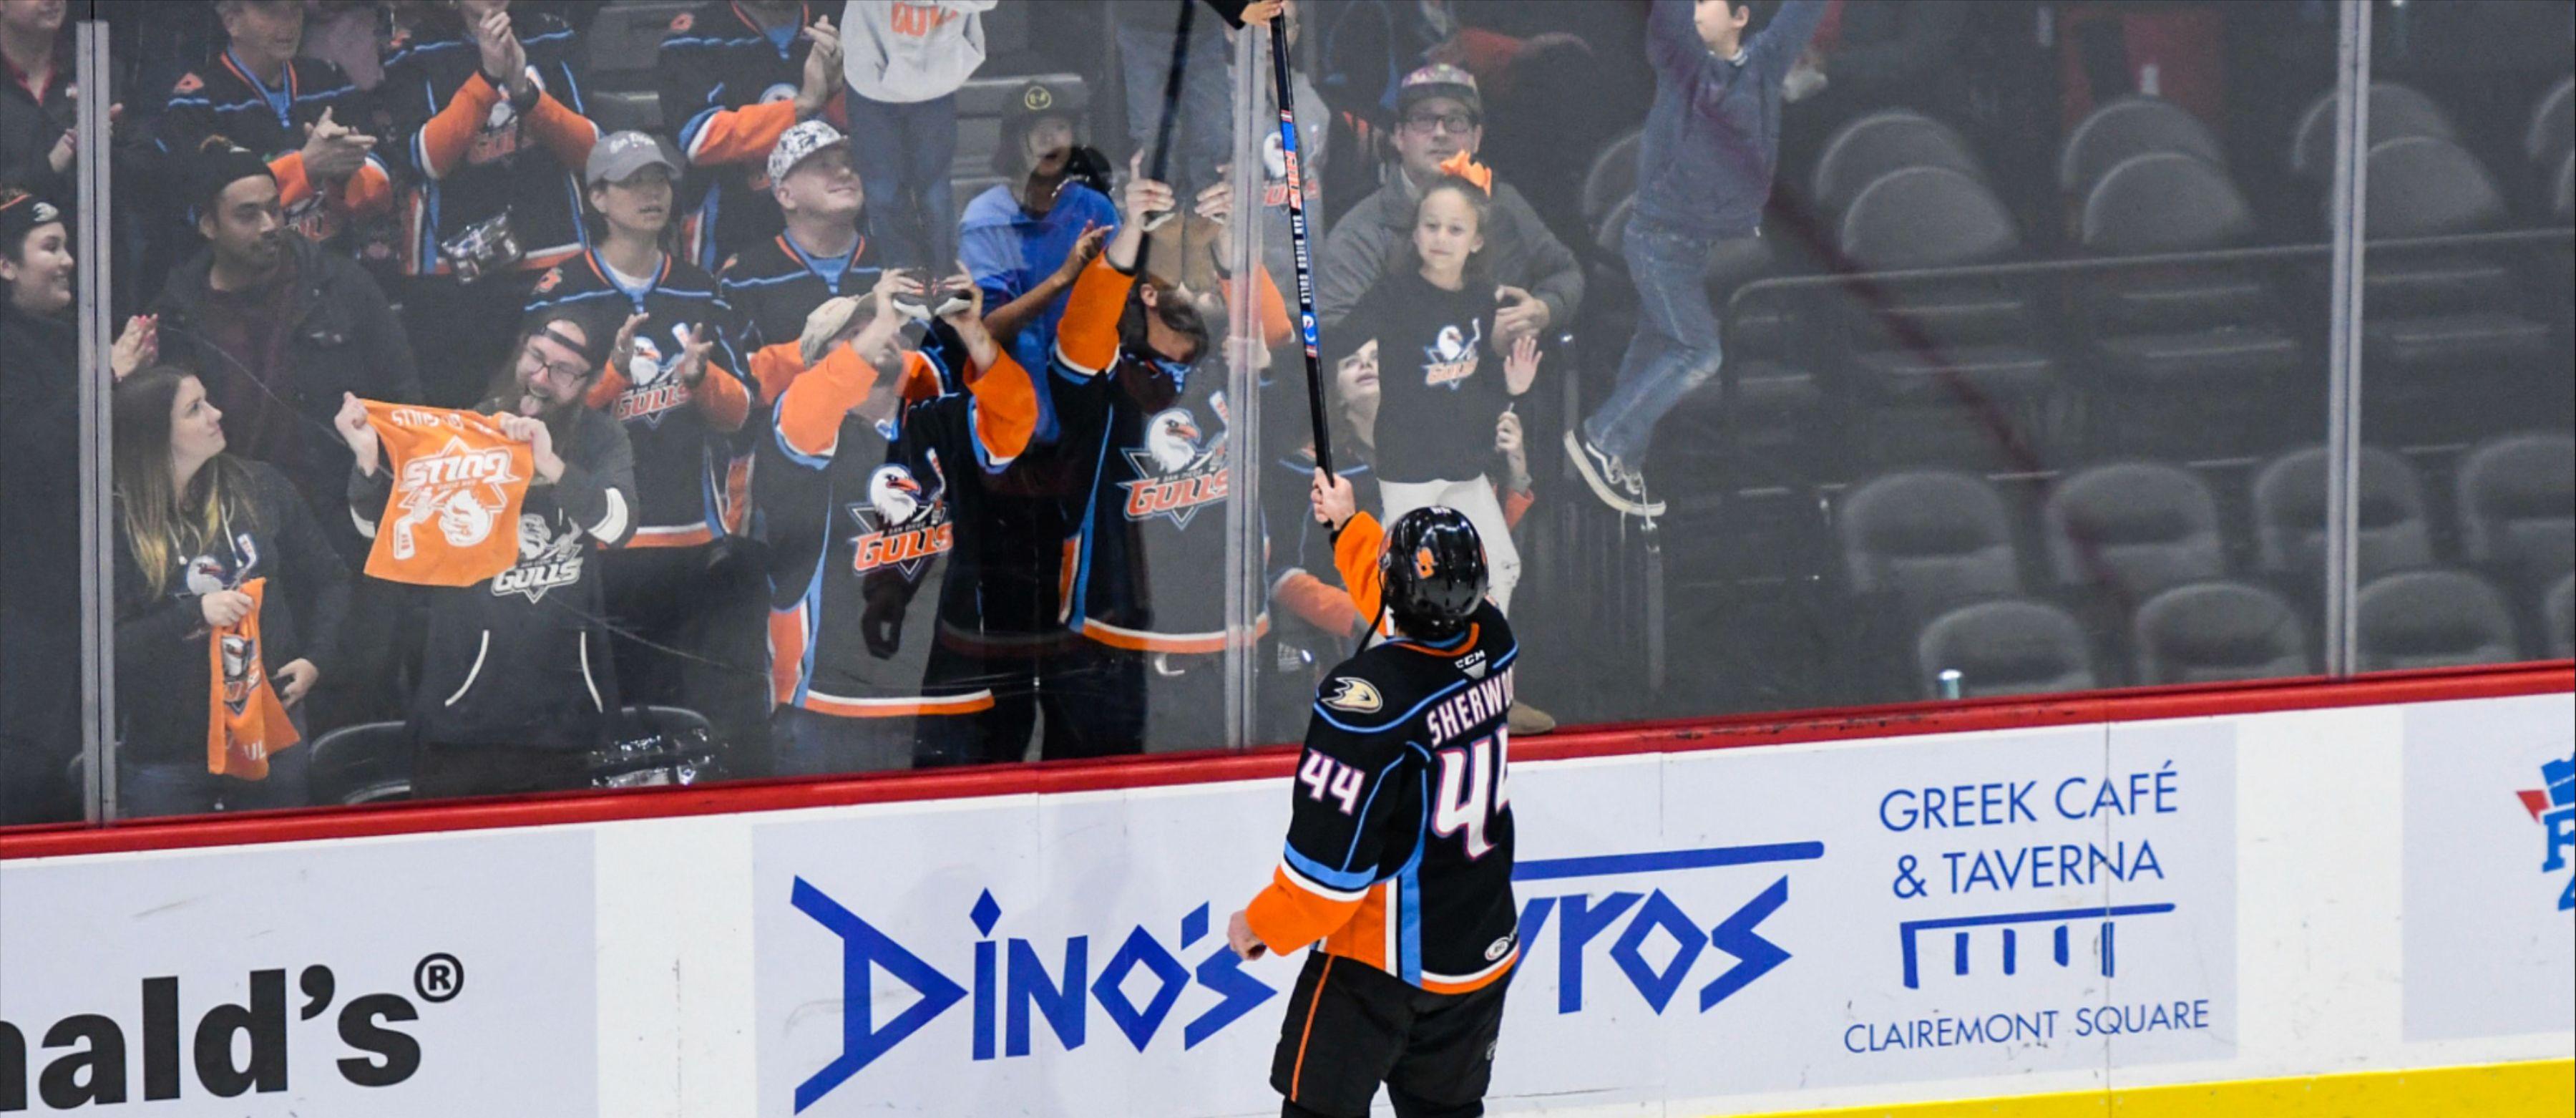 San Diego Gulls Receives 2019-2020 AHL Outstanding Fan Experience Award